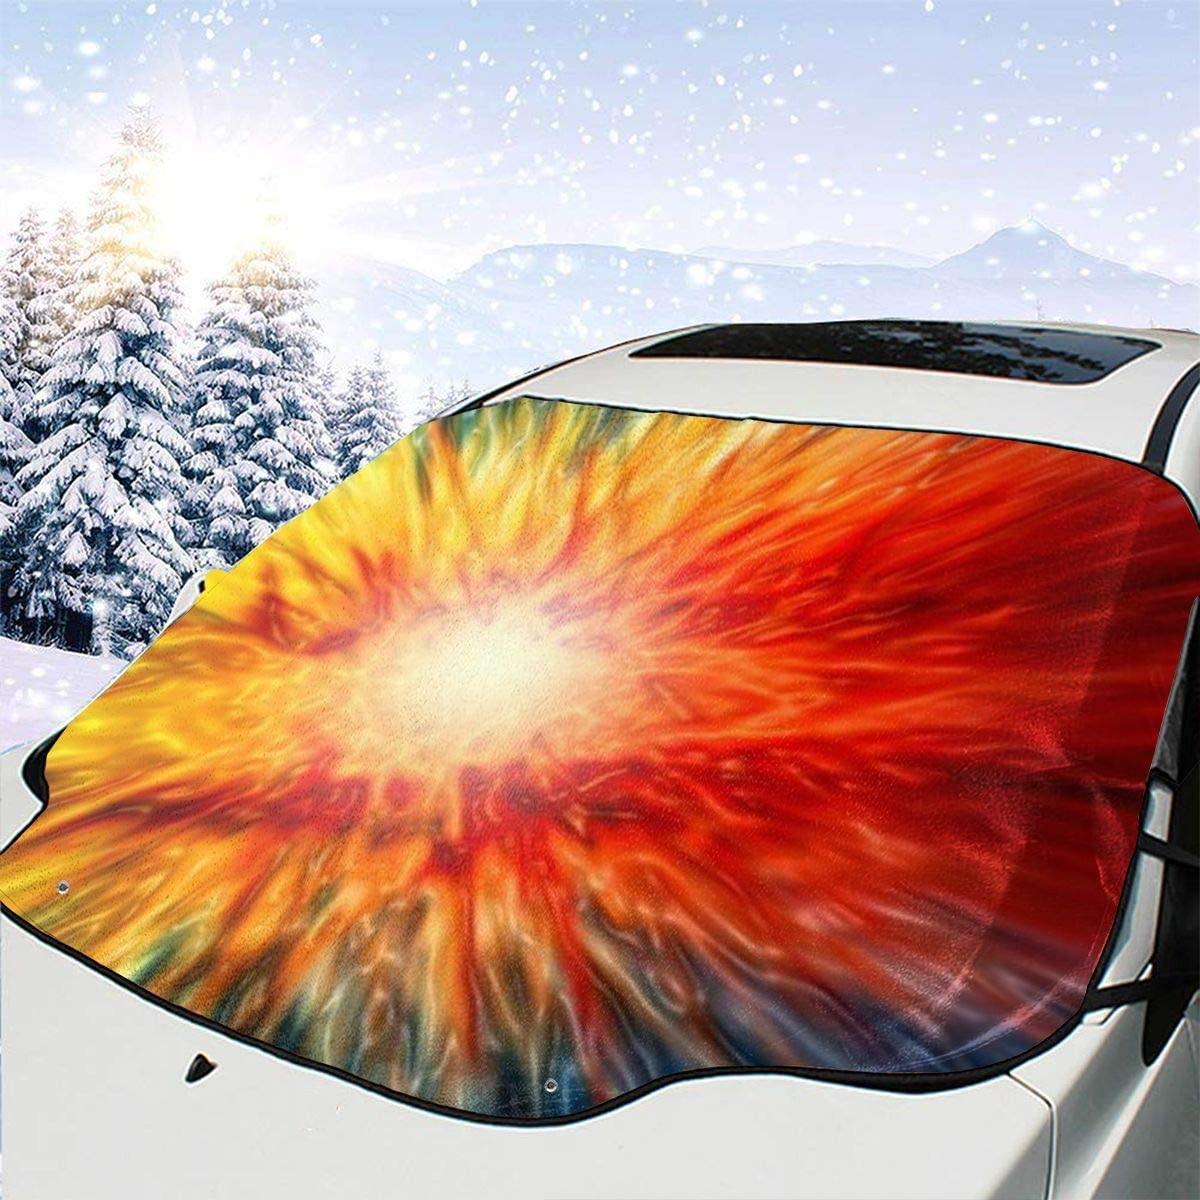 THONFIRE Car Front Window Windshields Winter Sun Shades Explosion Fire Cover Windproof Blocks Heat Keeps Your Vehicle Cool Visor Protector Minivan Spring Heatshield